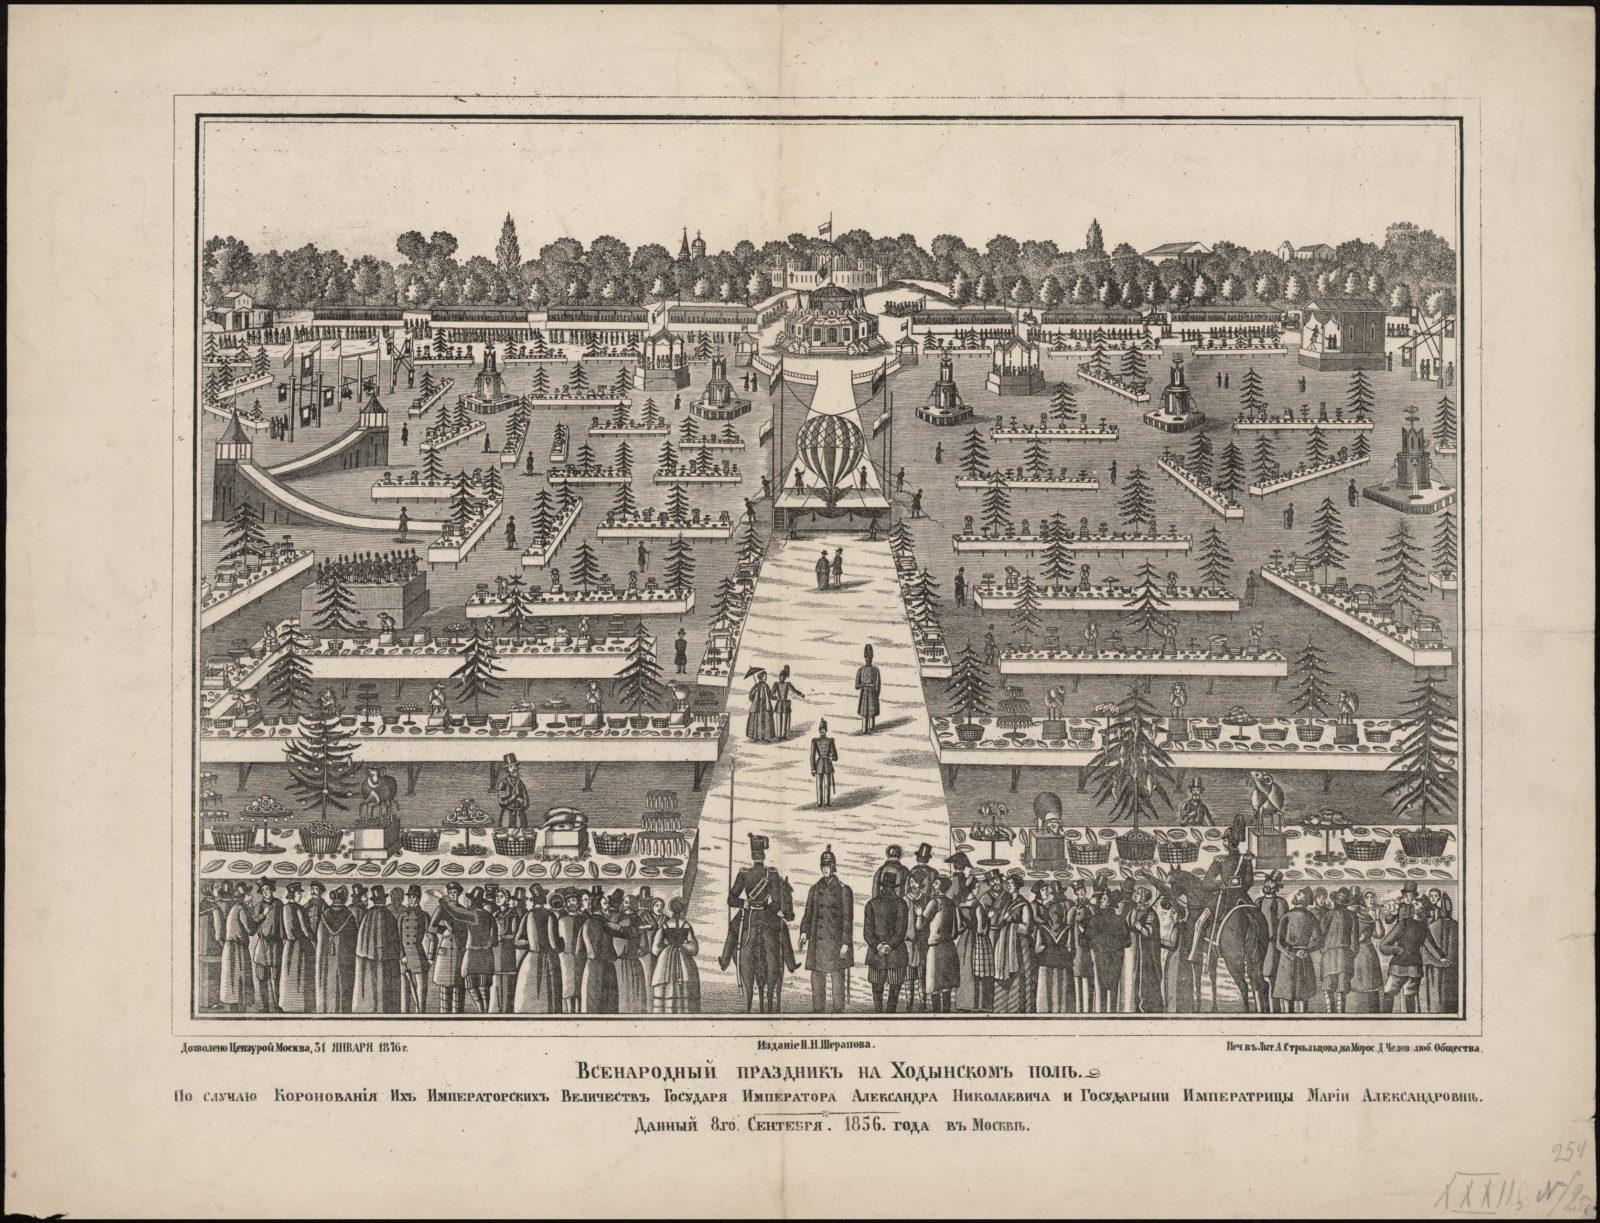 1856. National holiday on the Khodynka field